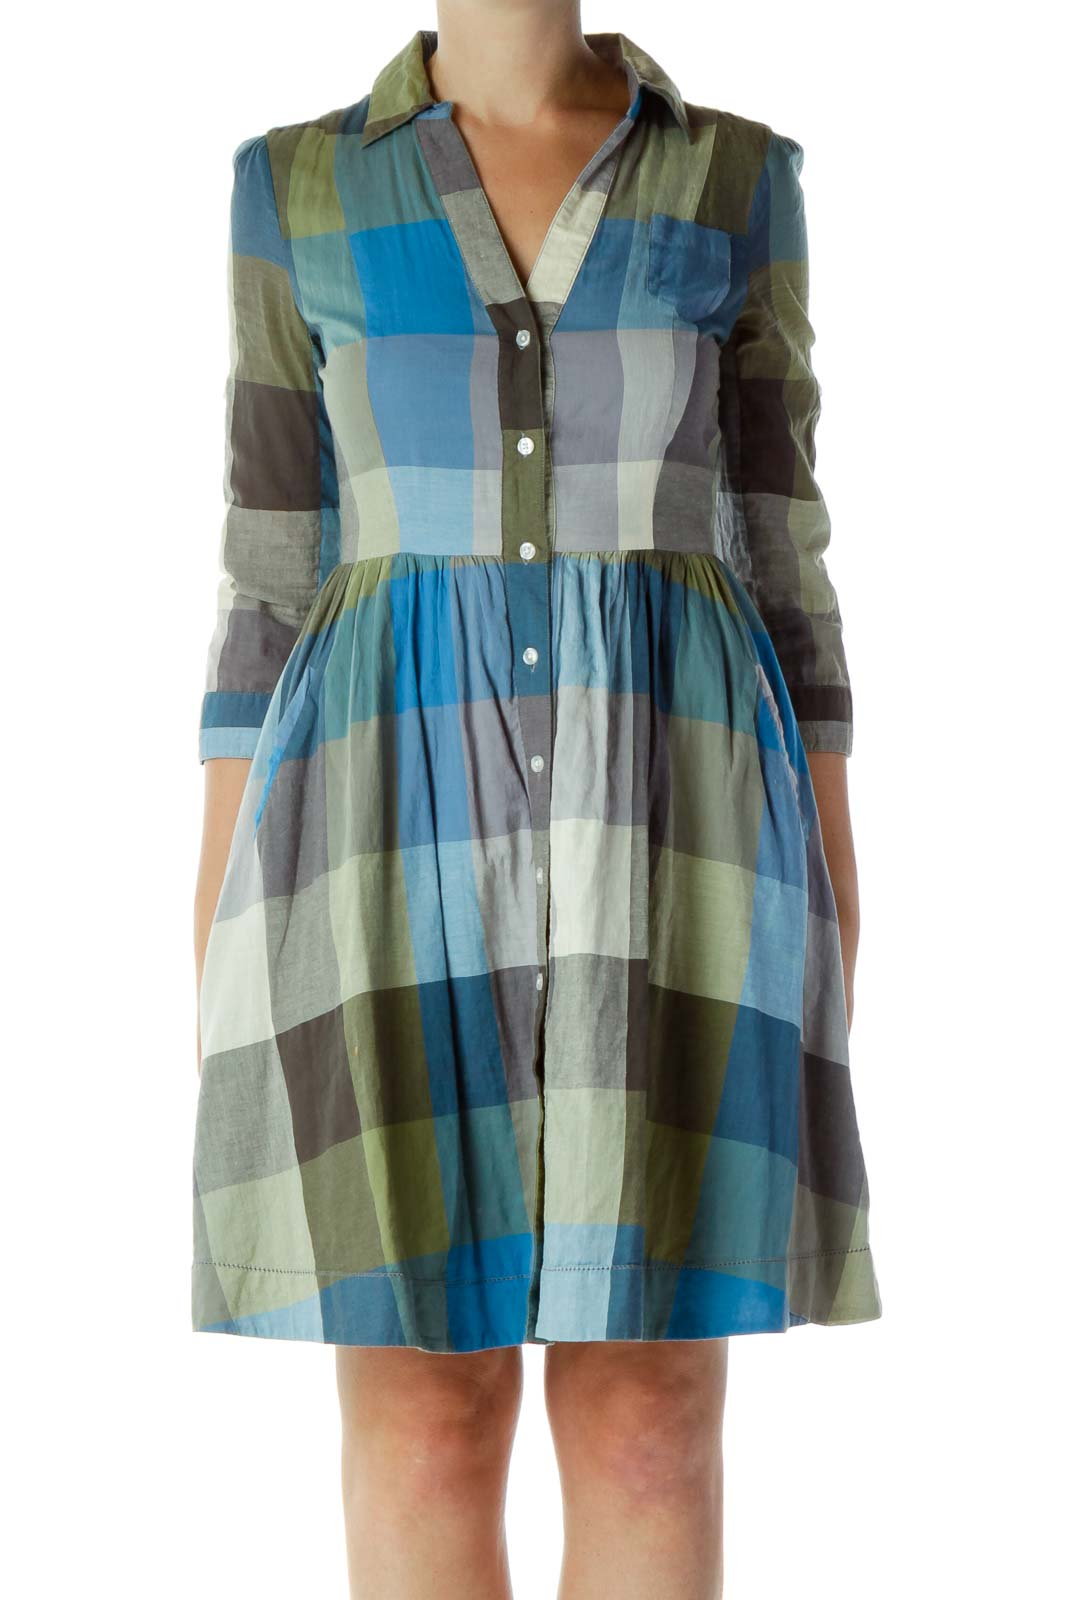 Blue & Green Gingham Dress